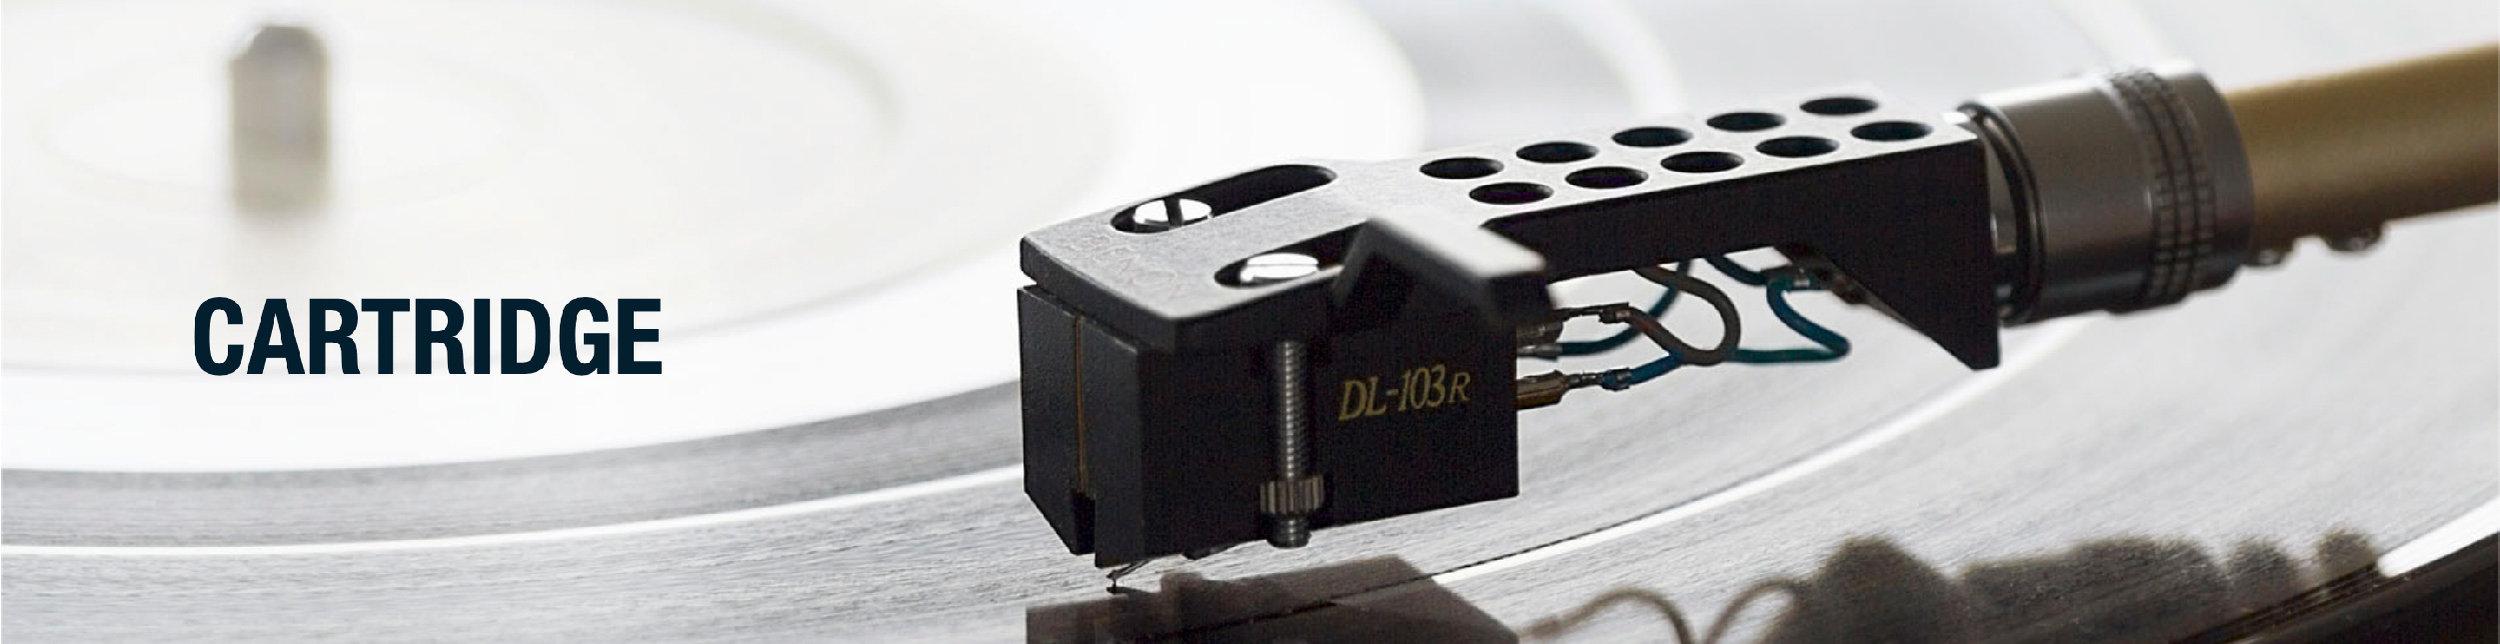 DENON BANNER-01.jpg